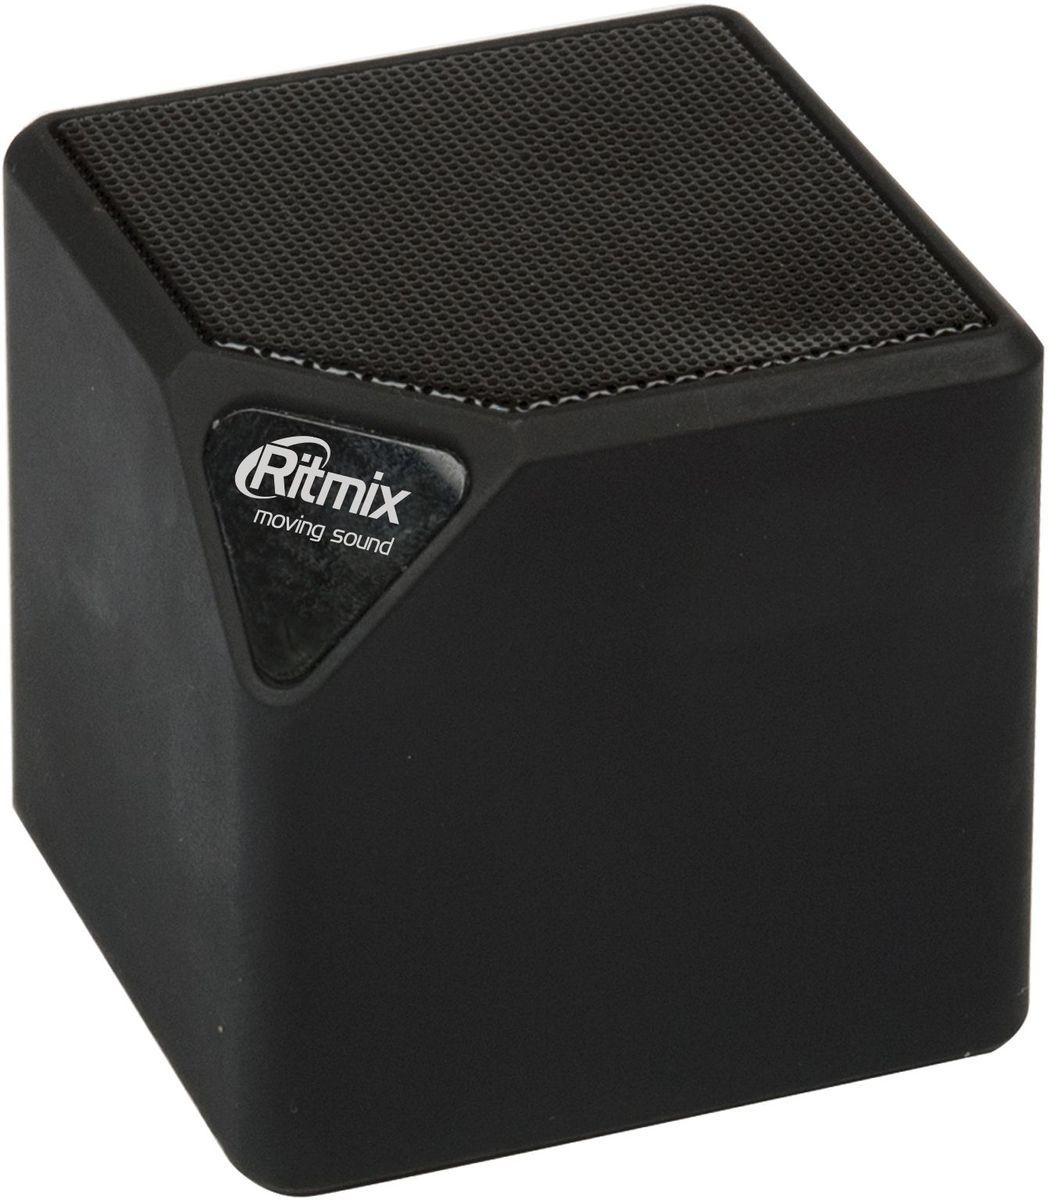 Ritmix SP-140B, Black портативная акустическая система ritmix sp 140b blue white